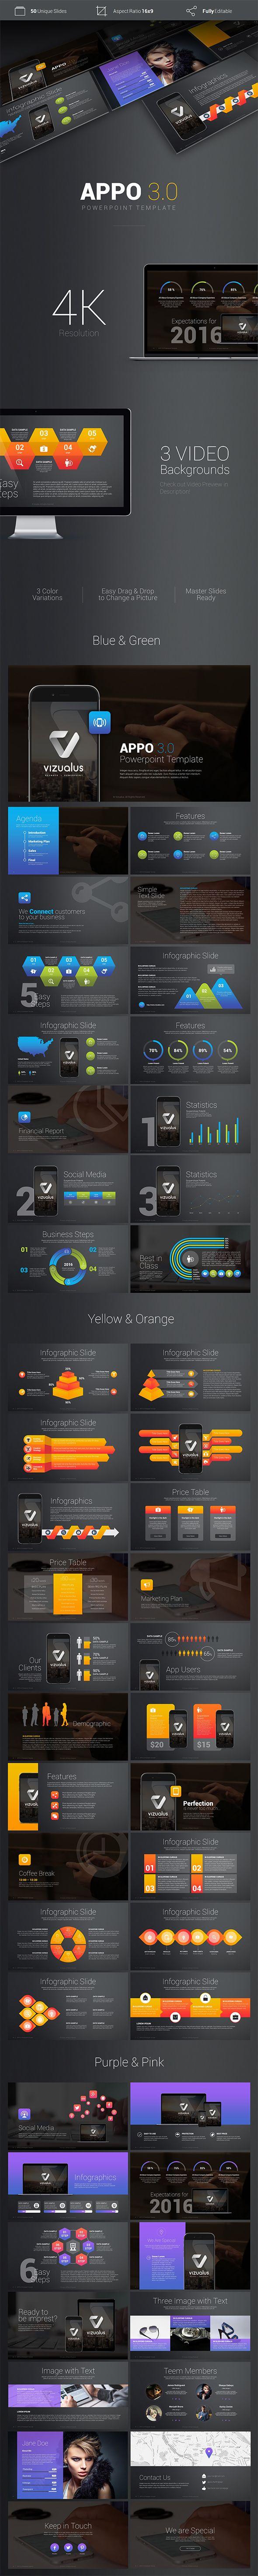 Premium App Powerpoint Template #slides #design Download: http://graphicriver.net/item/premium-app-powerpoint-template/14328971?ref=ksioks